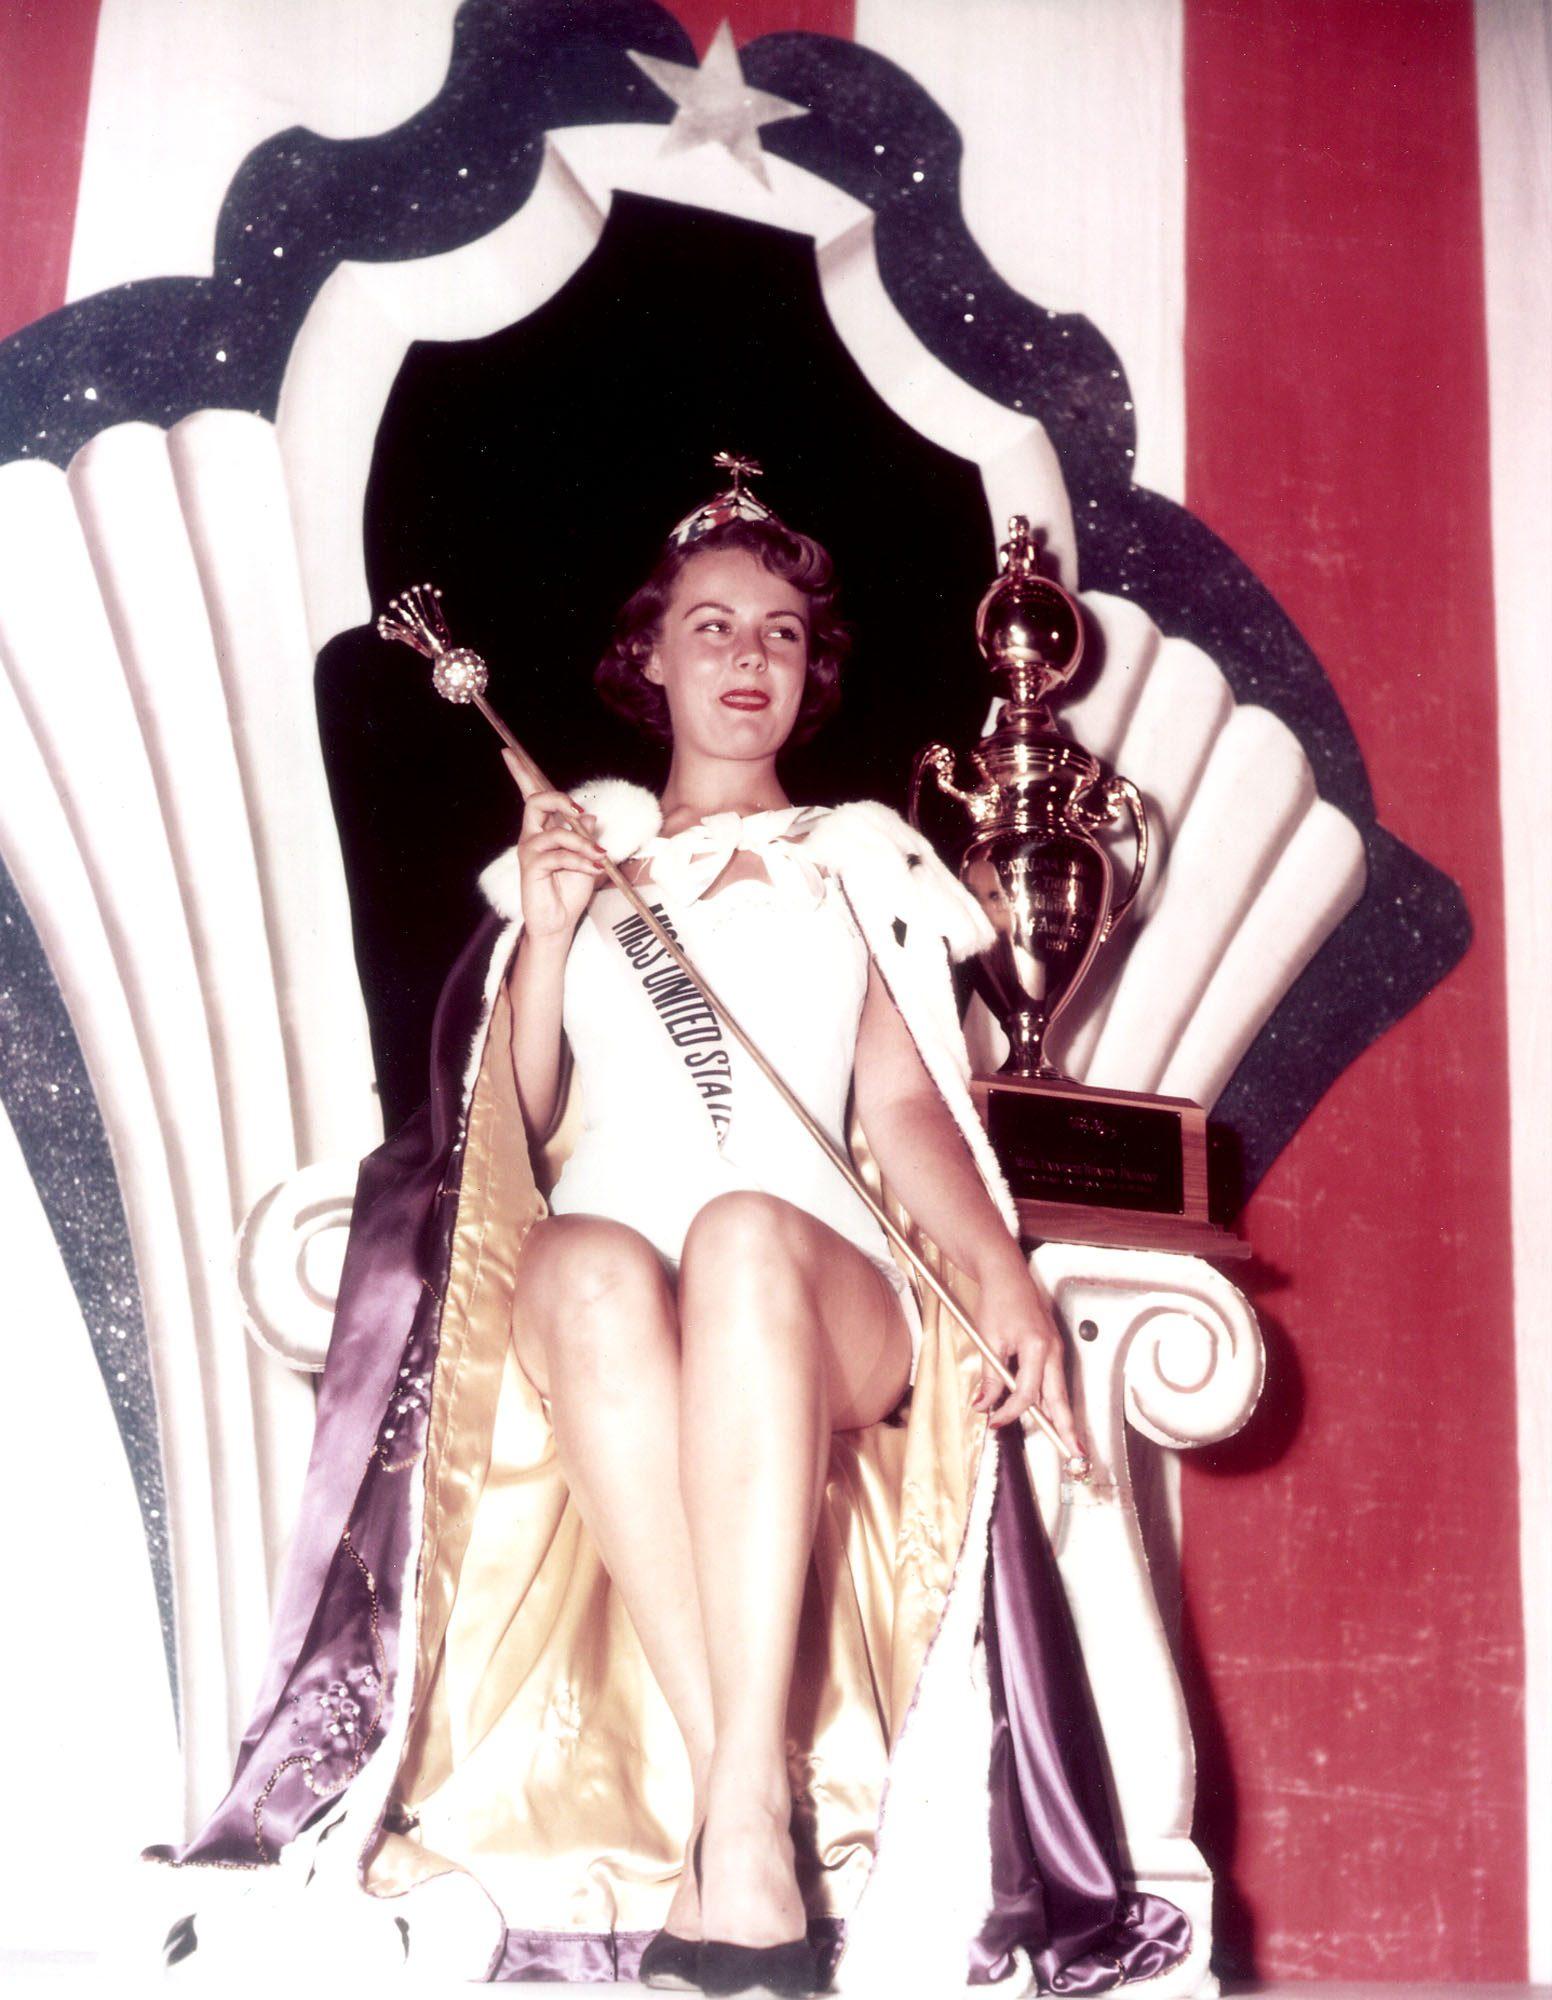 Myrna Hansen, MISS USA 1953